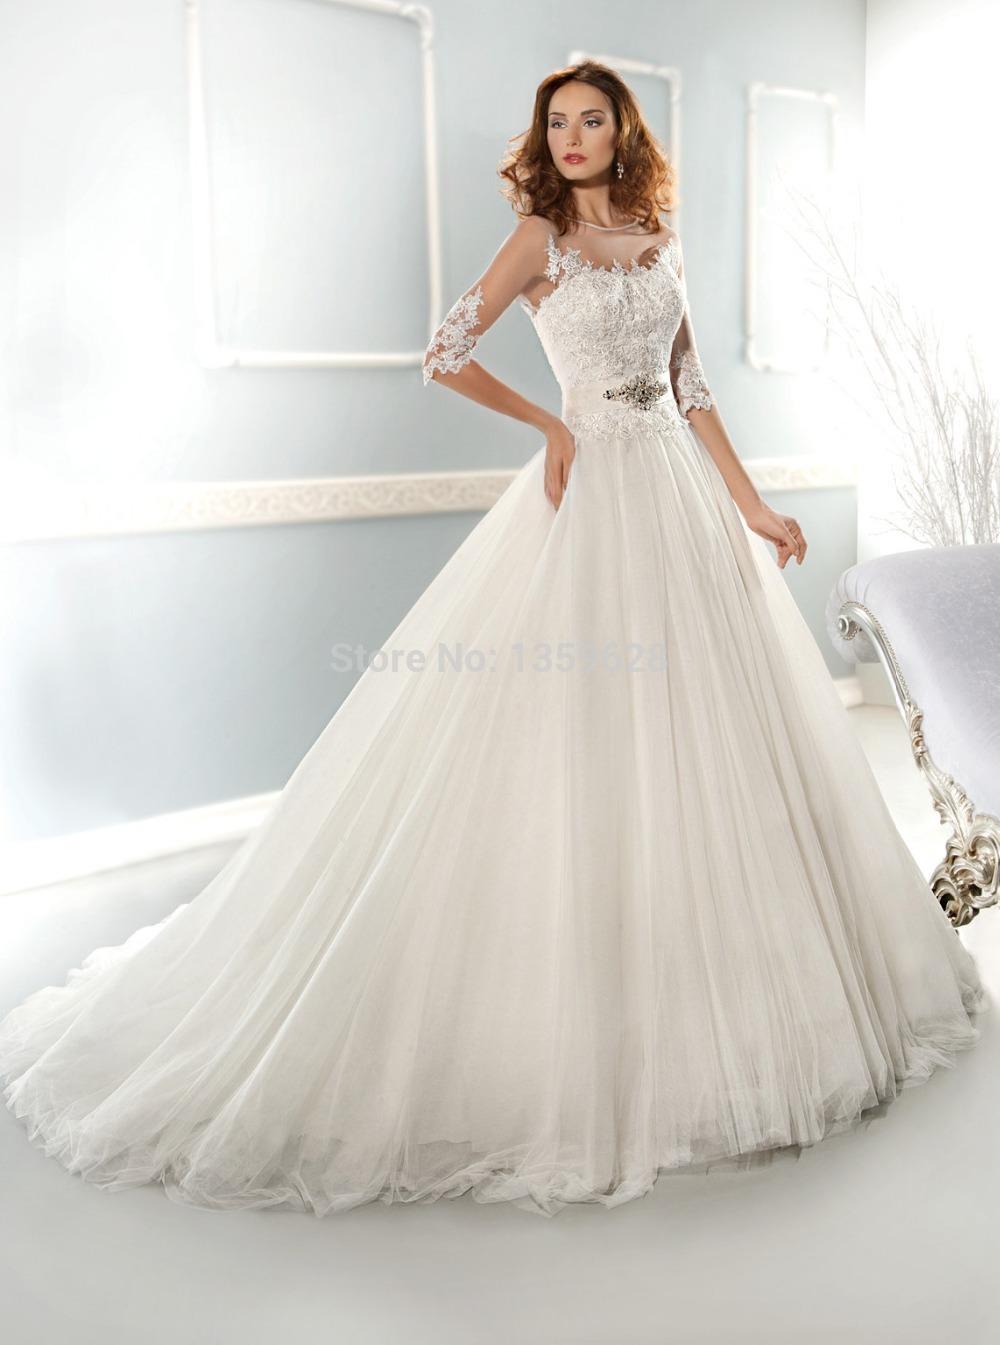 New modern wedding dresses top designer wedding dresses 2015 top designer wedding dresses 2015 ombrellifo Choice Image